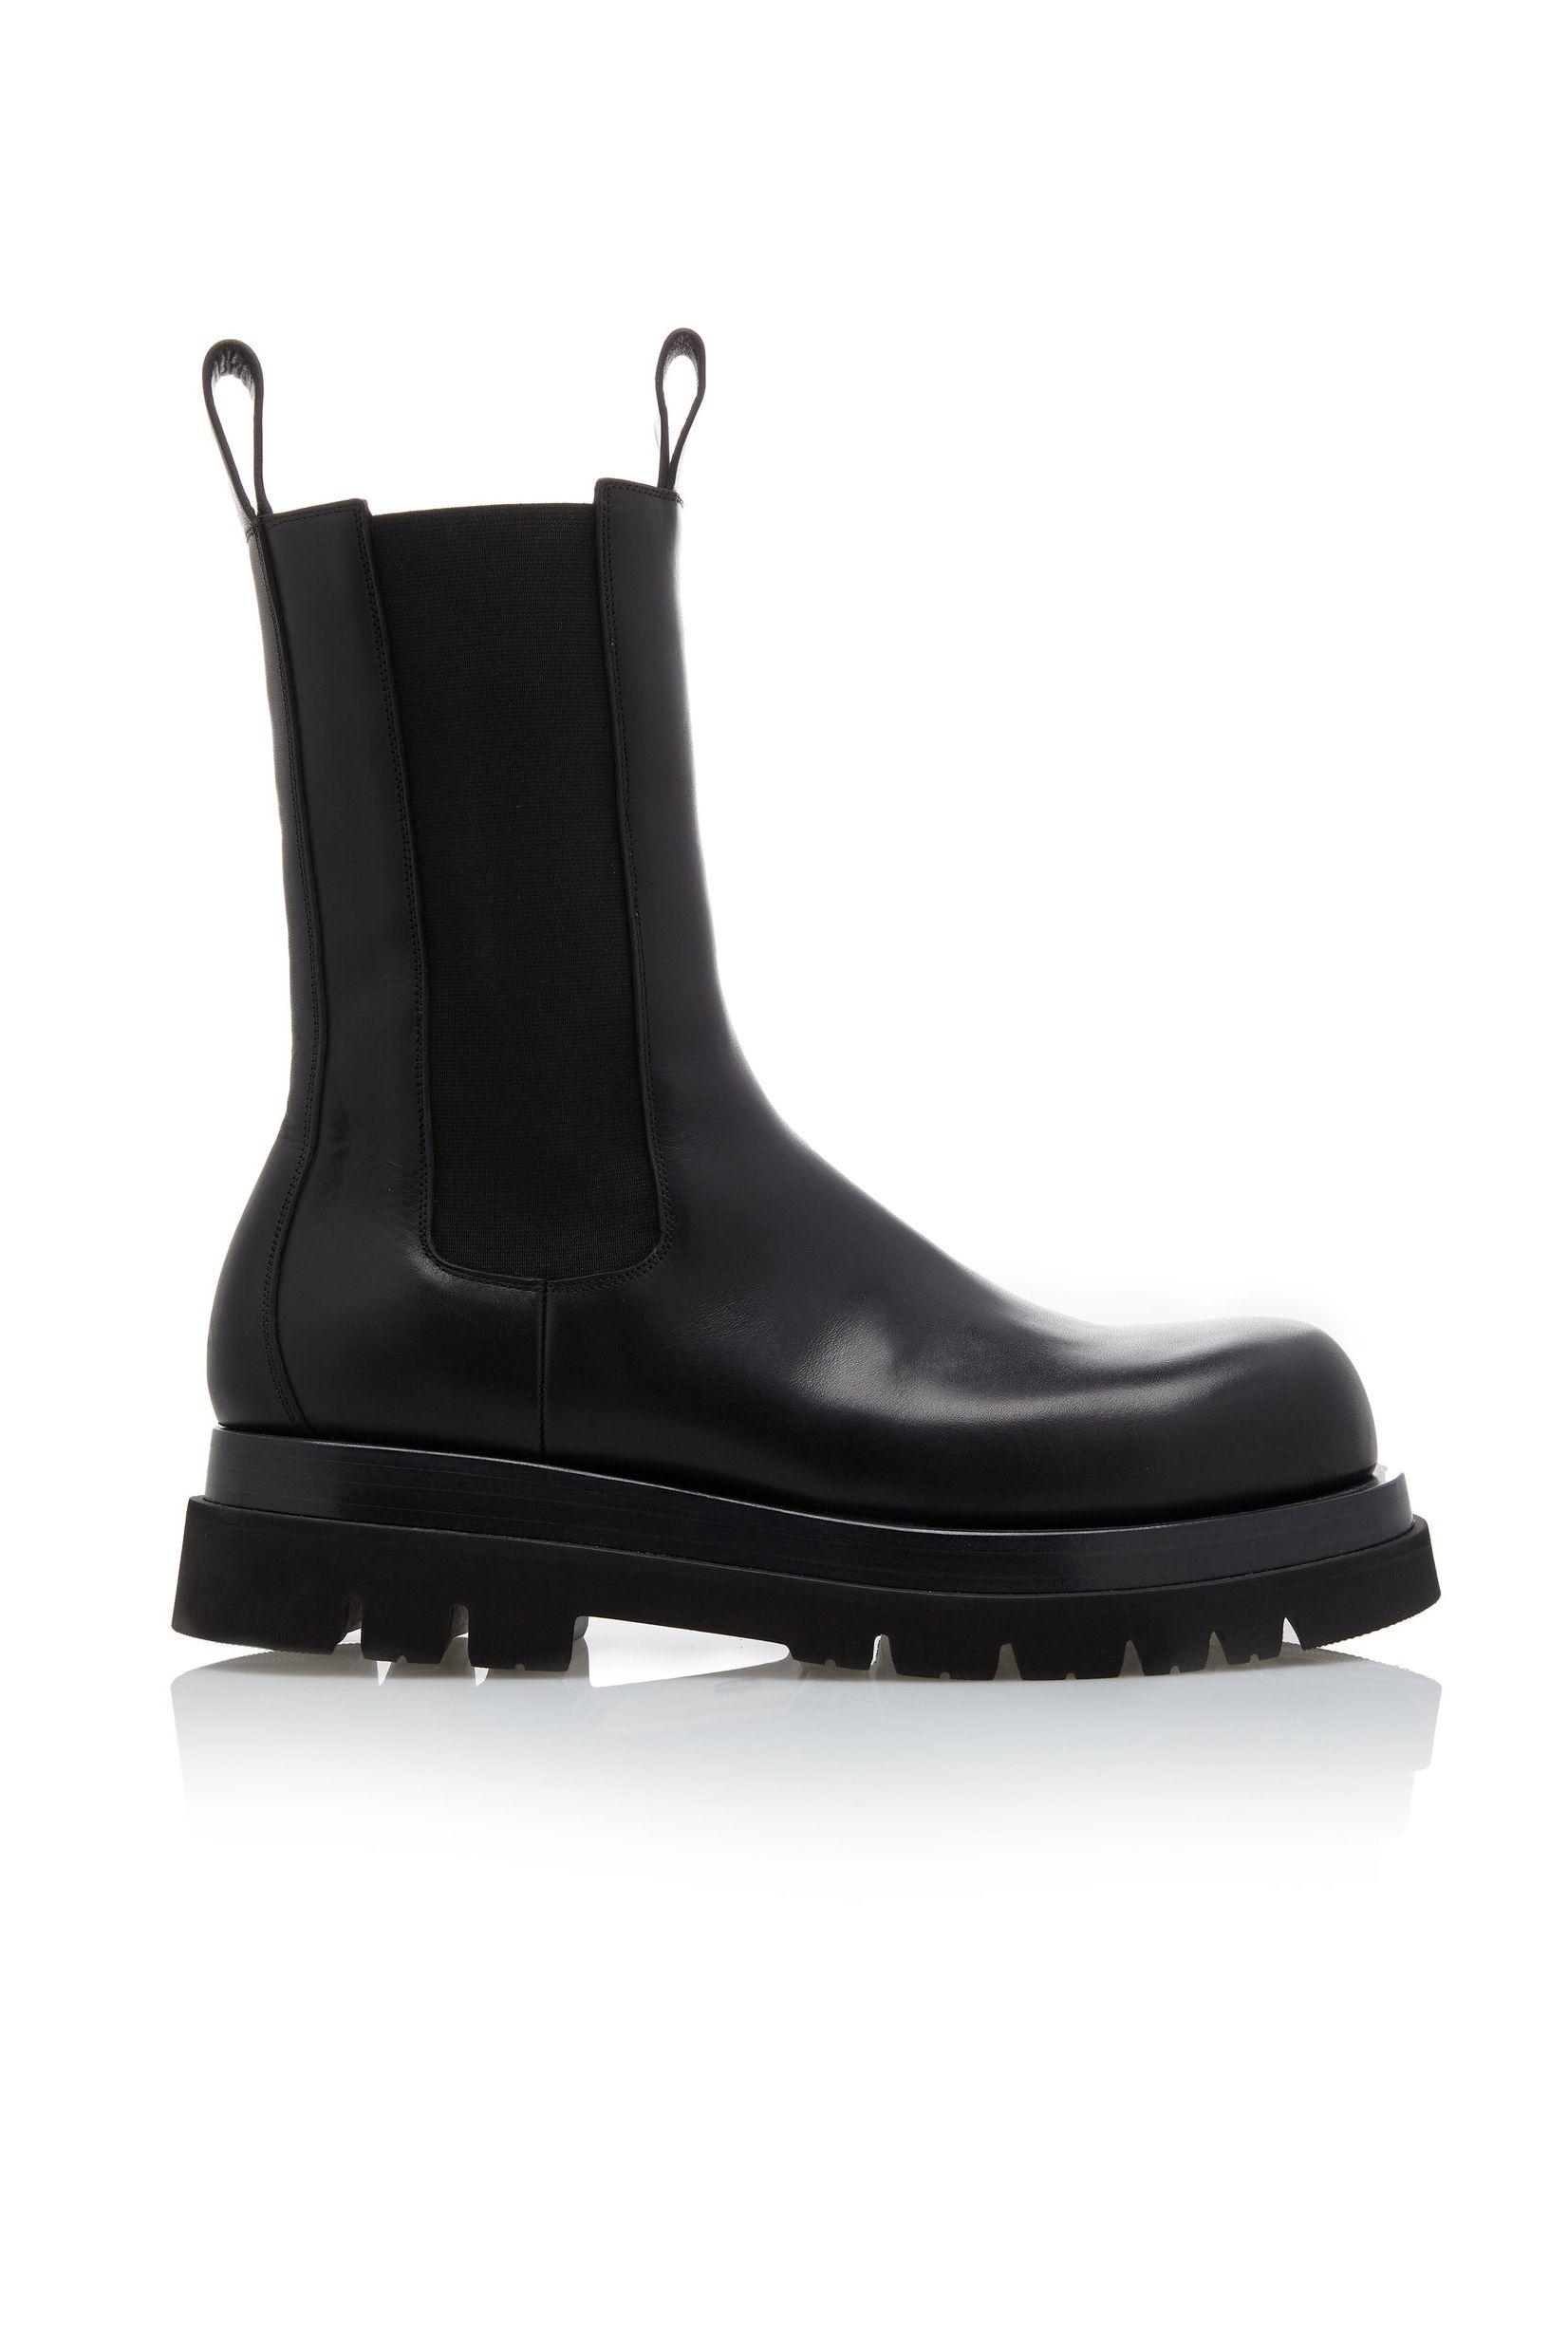 The 10 Best Men's Chelsea Boots 2020